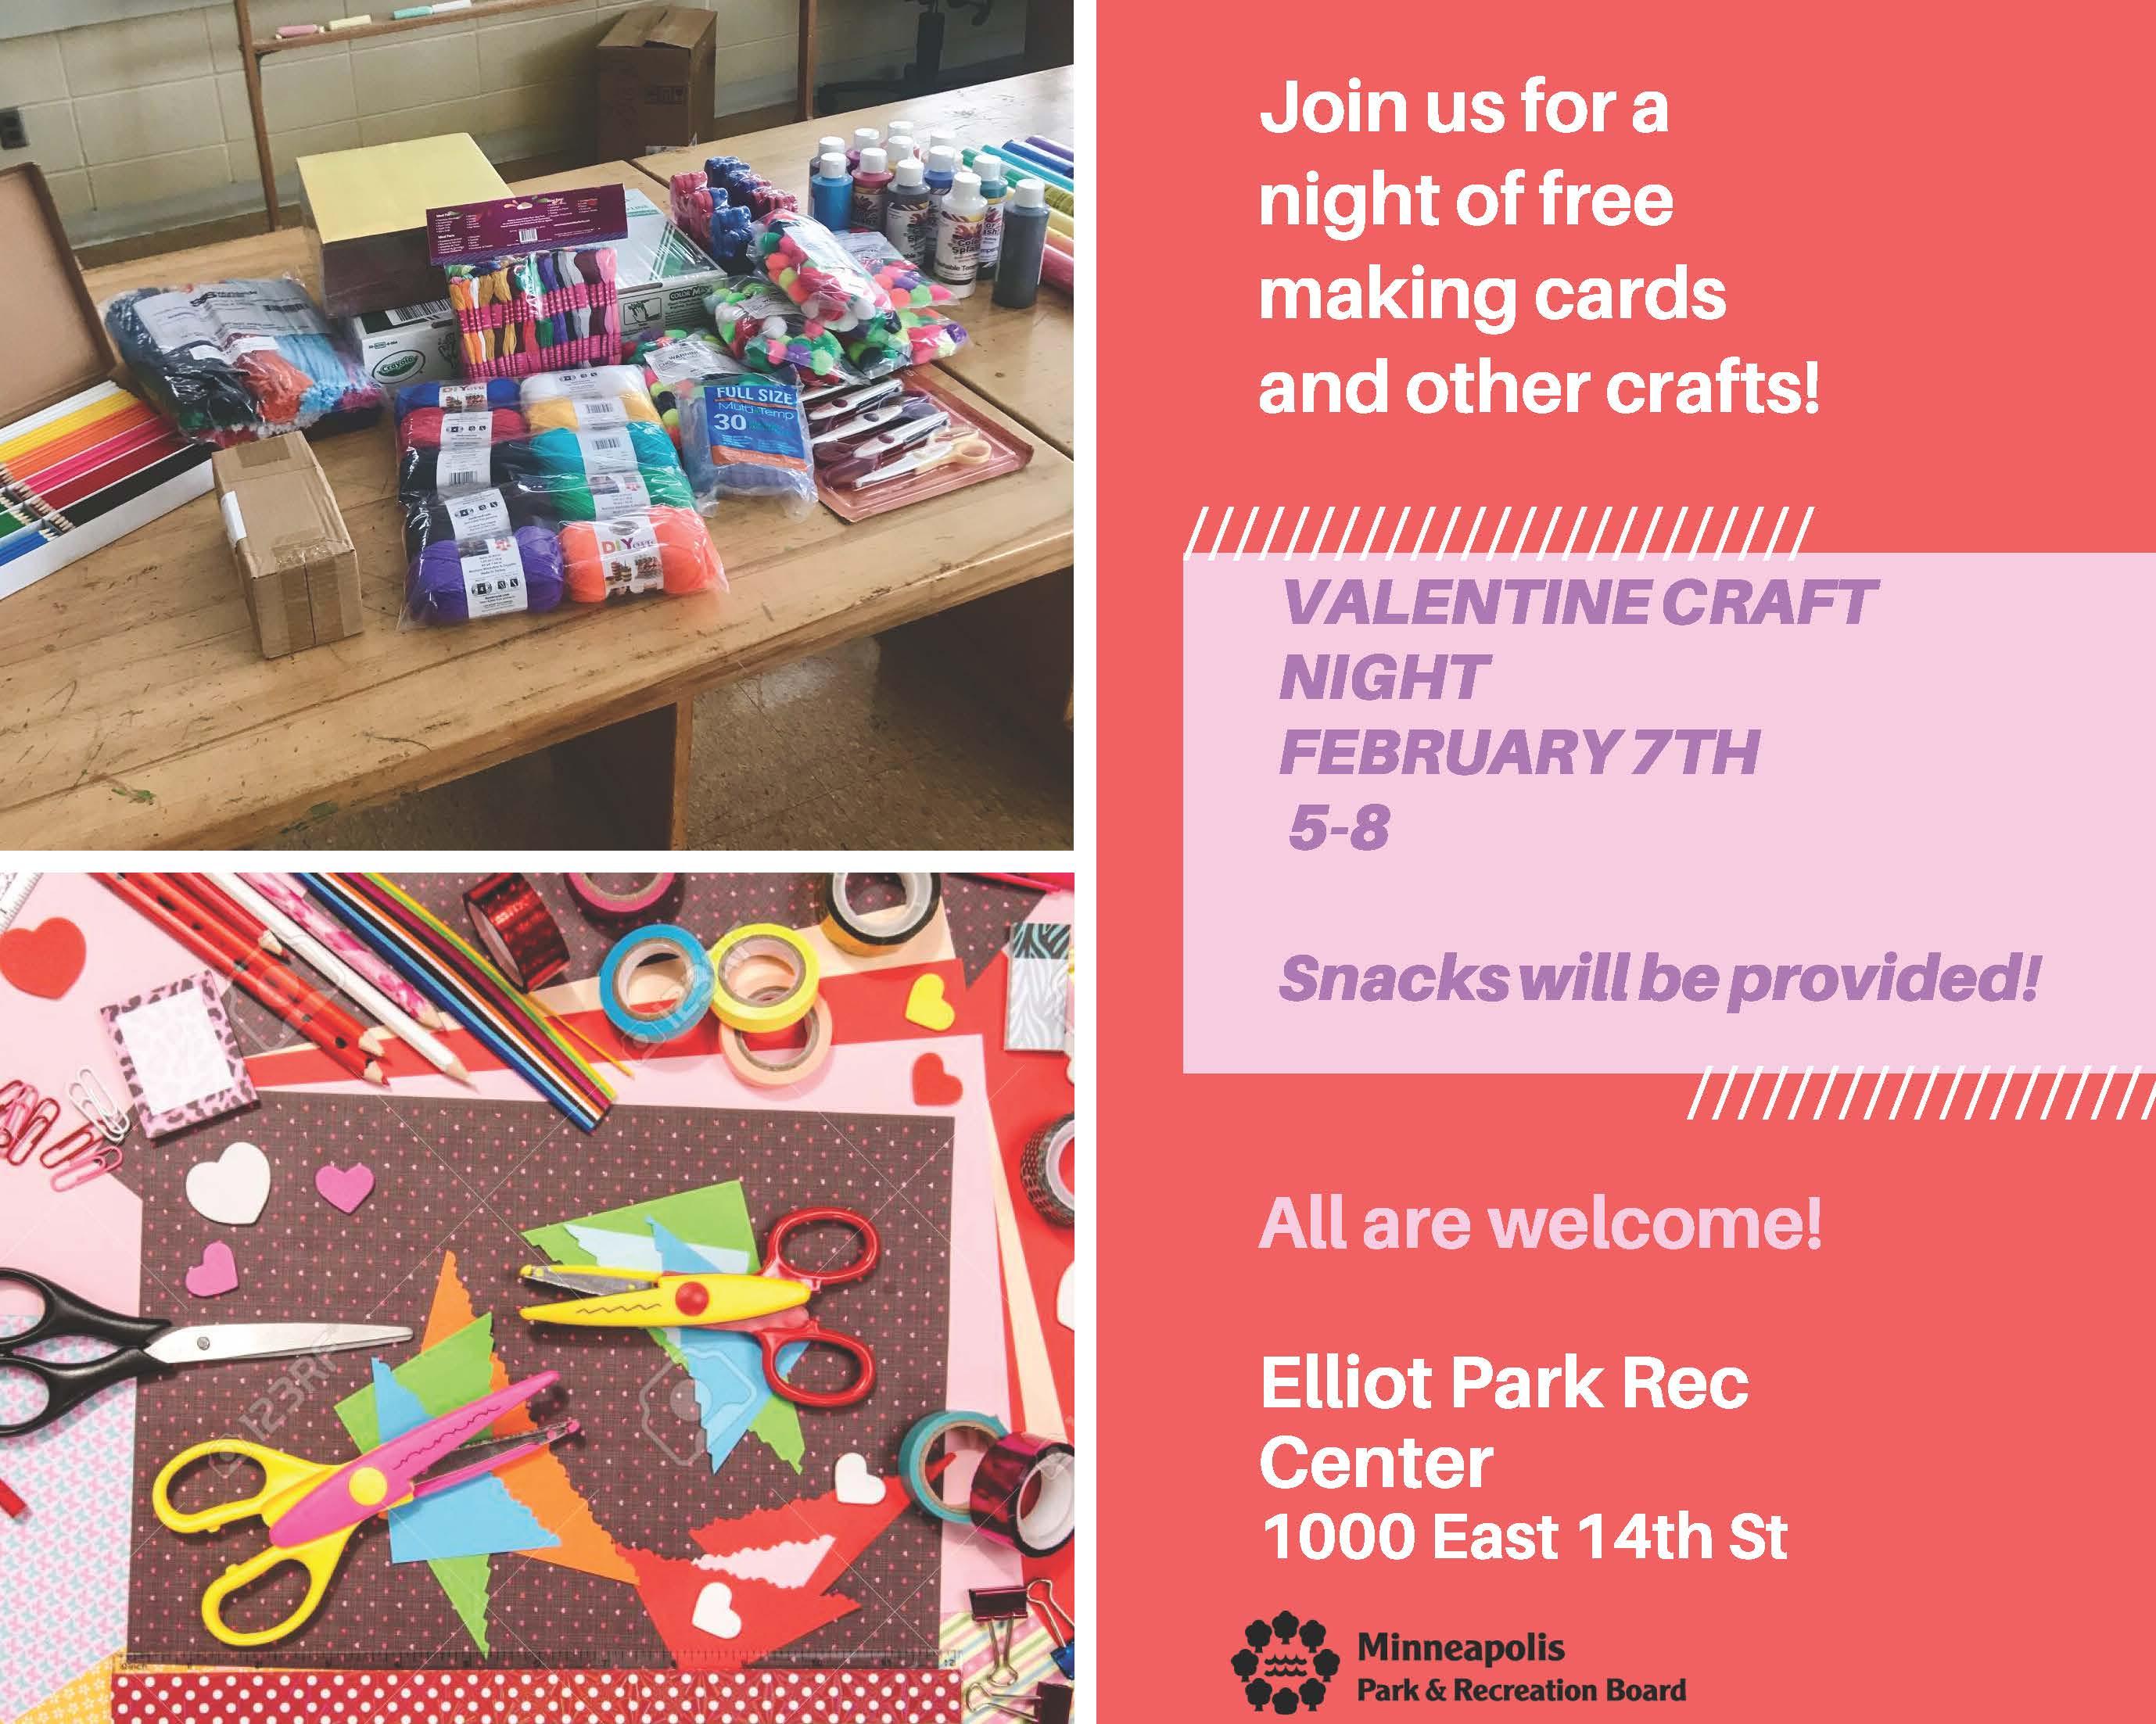 Valentine's craft night